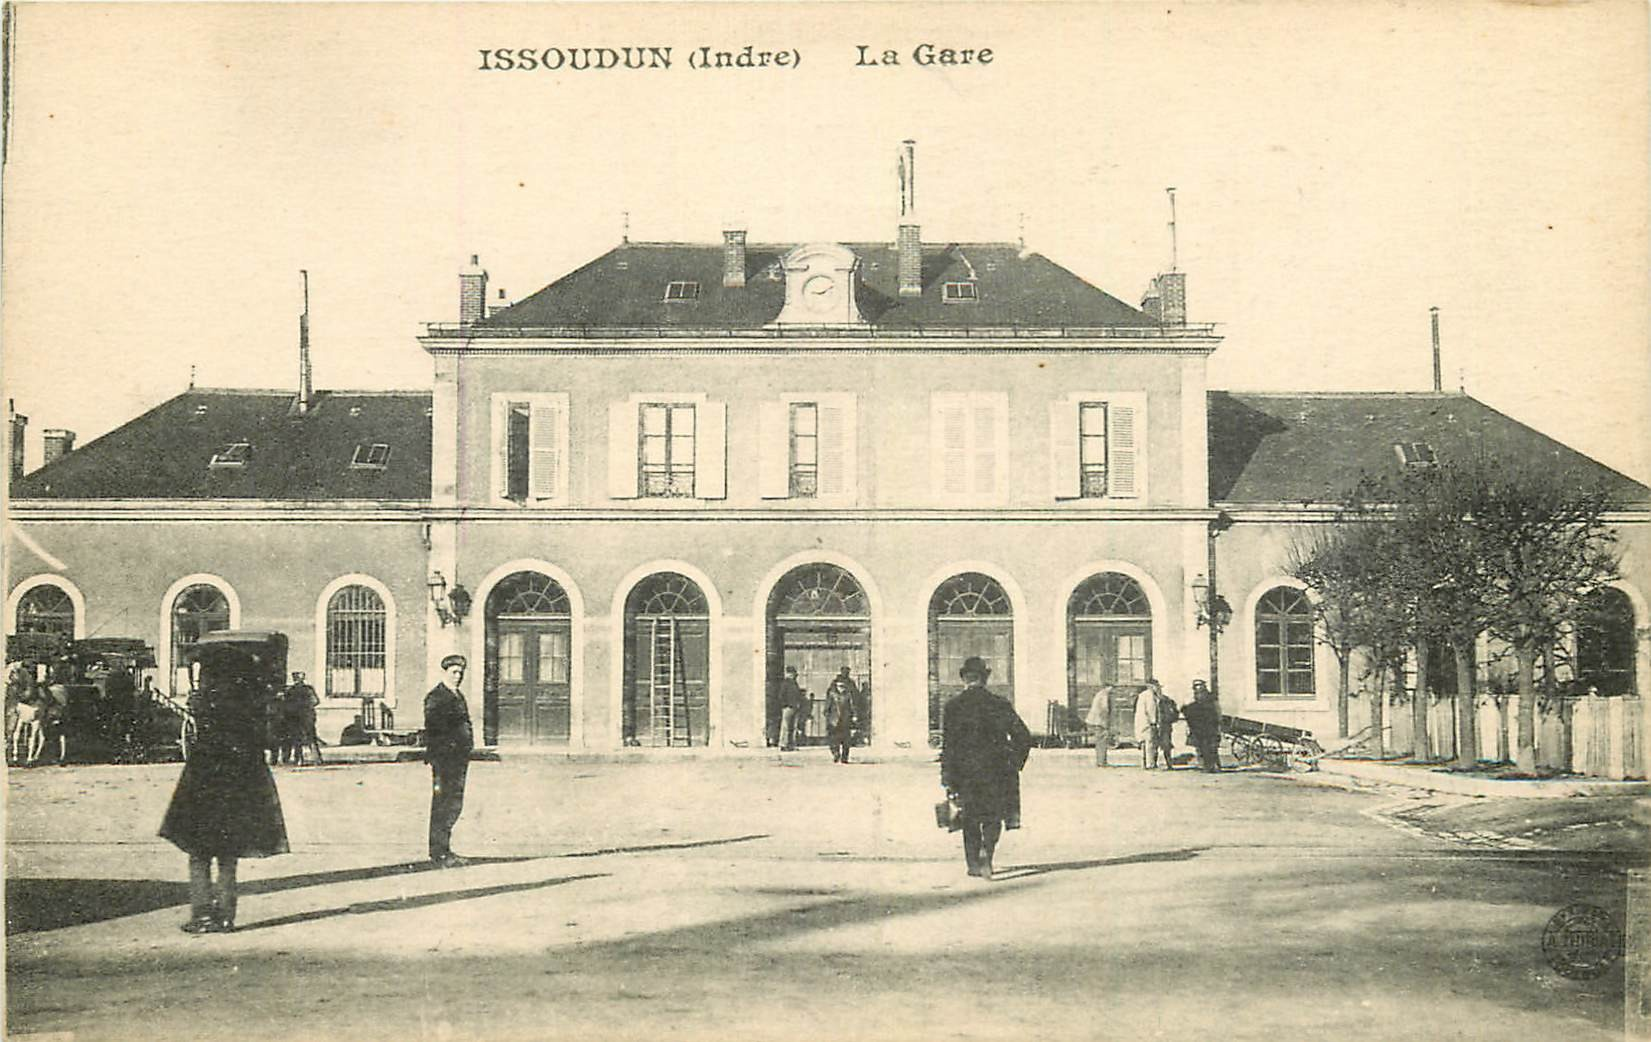 36 ISSOUDUN. La Gare